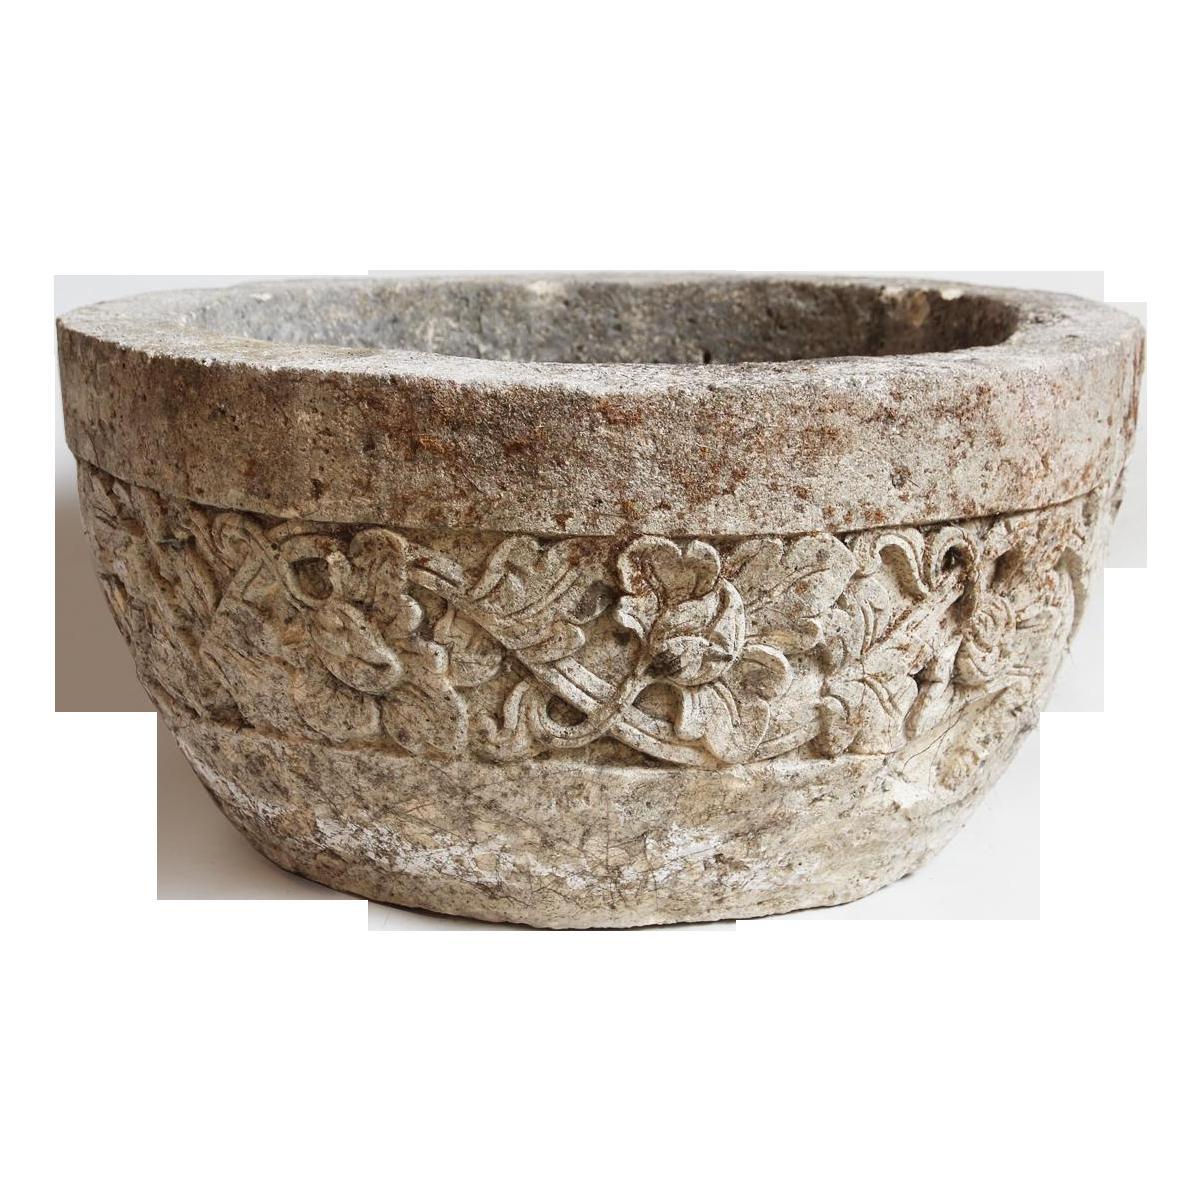 Stone Carved Planter Bowl Chairish